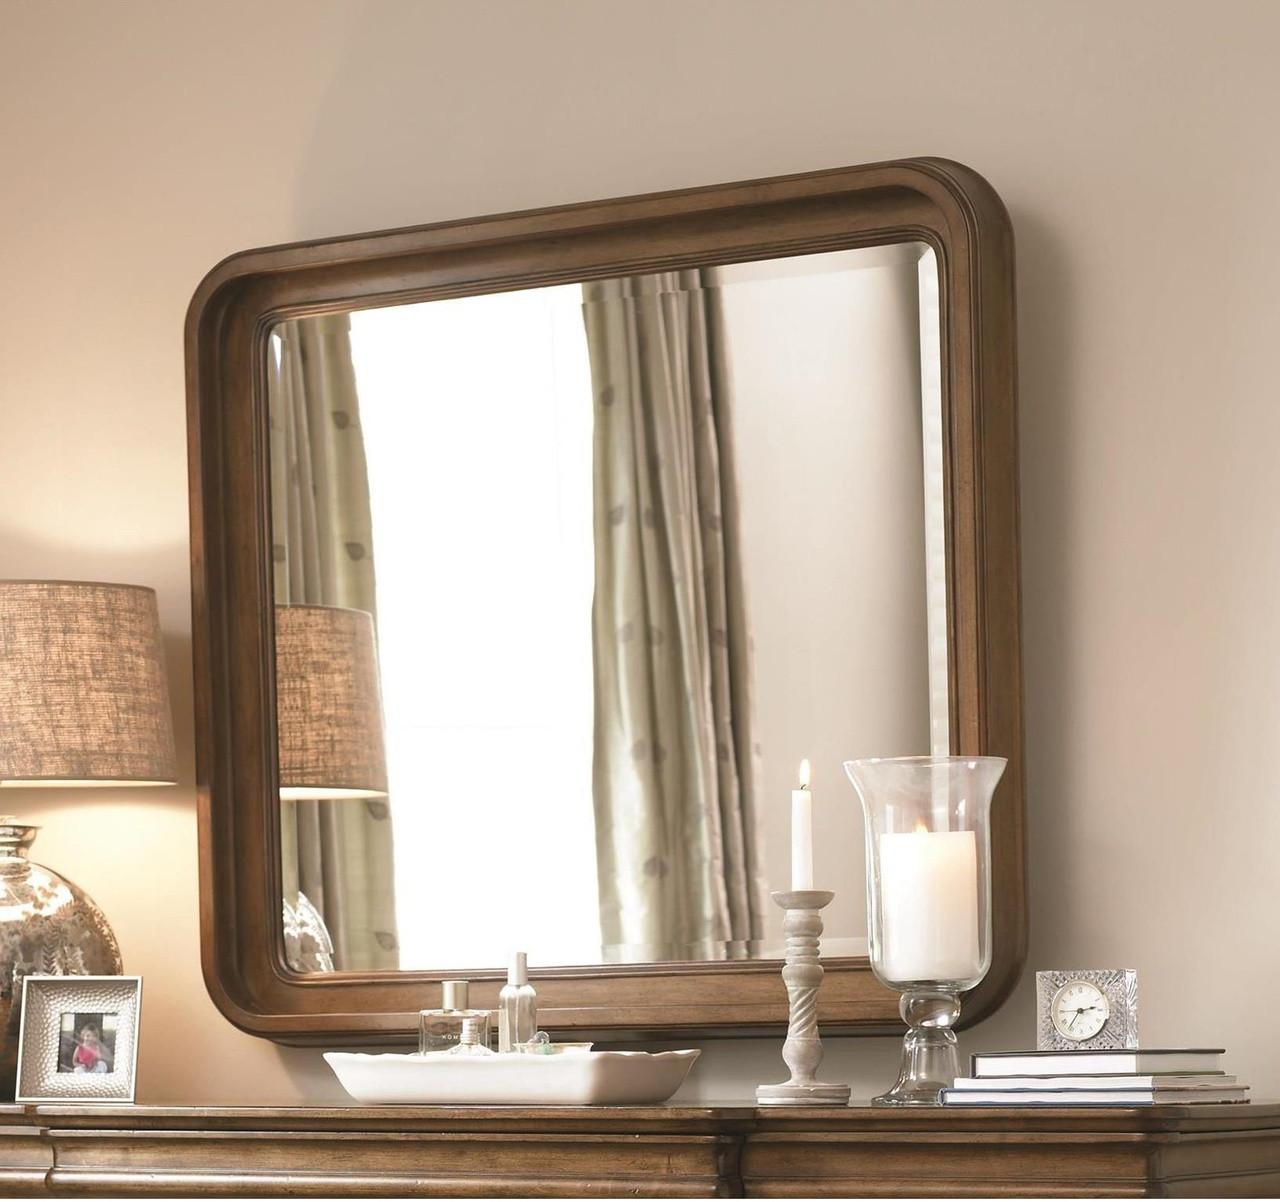 dc7fadef797d8 Louis Philippe Solid Wood Bedroom Landscape Mirror - Cognac